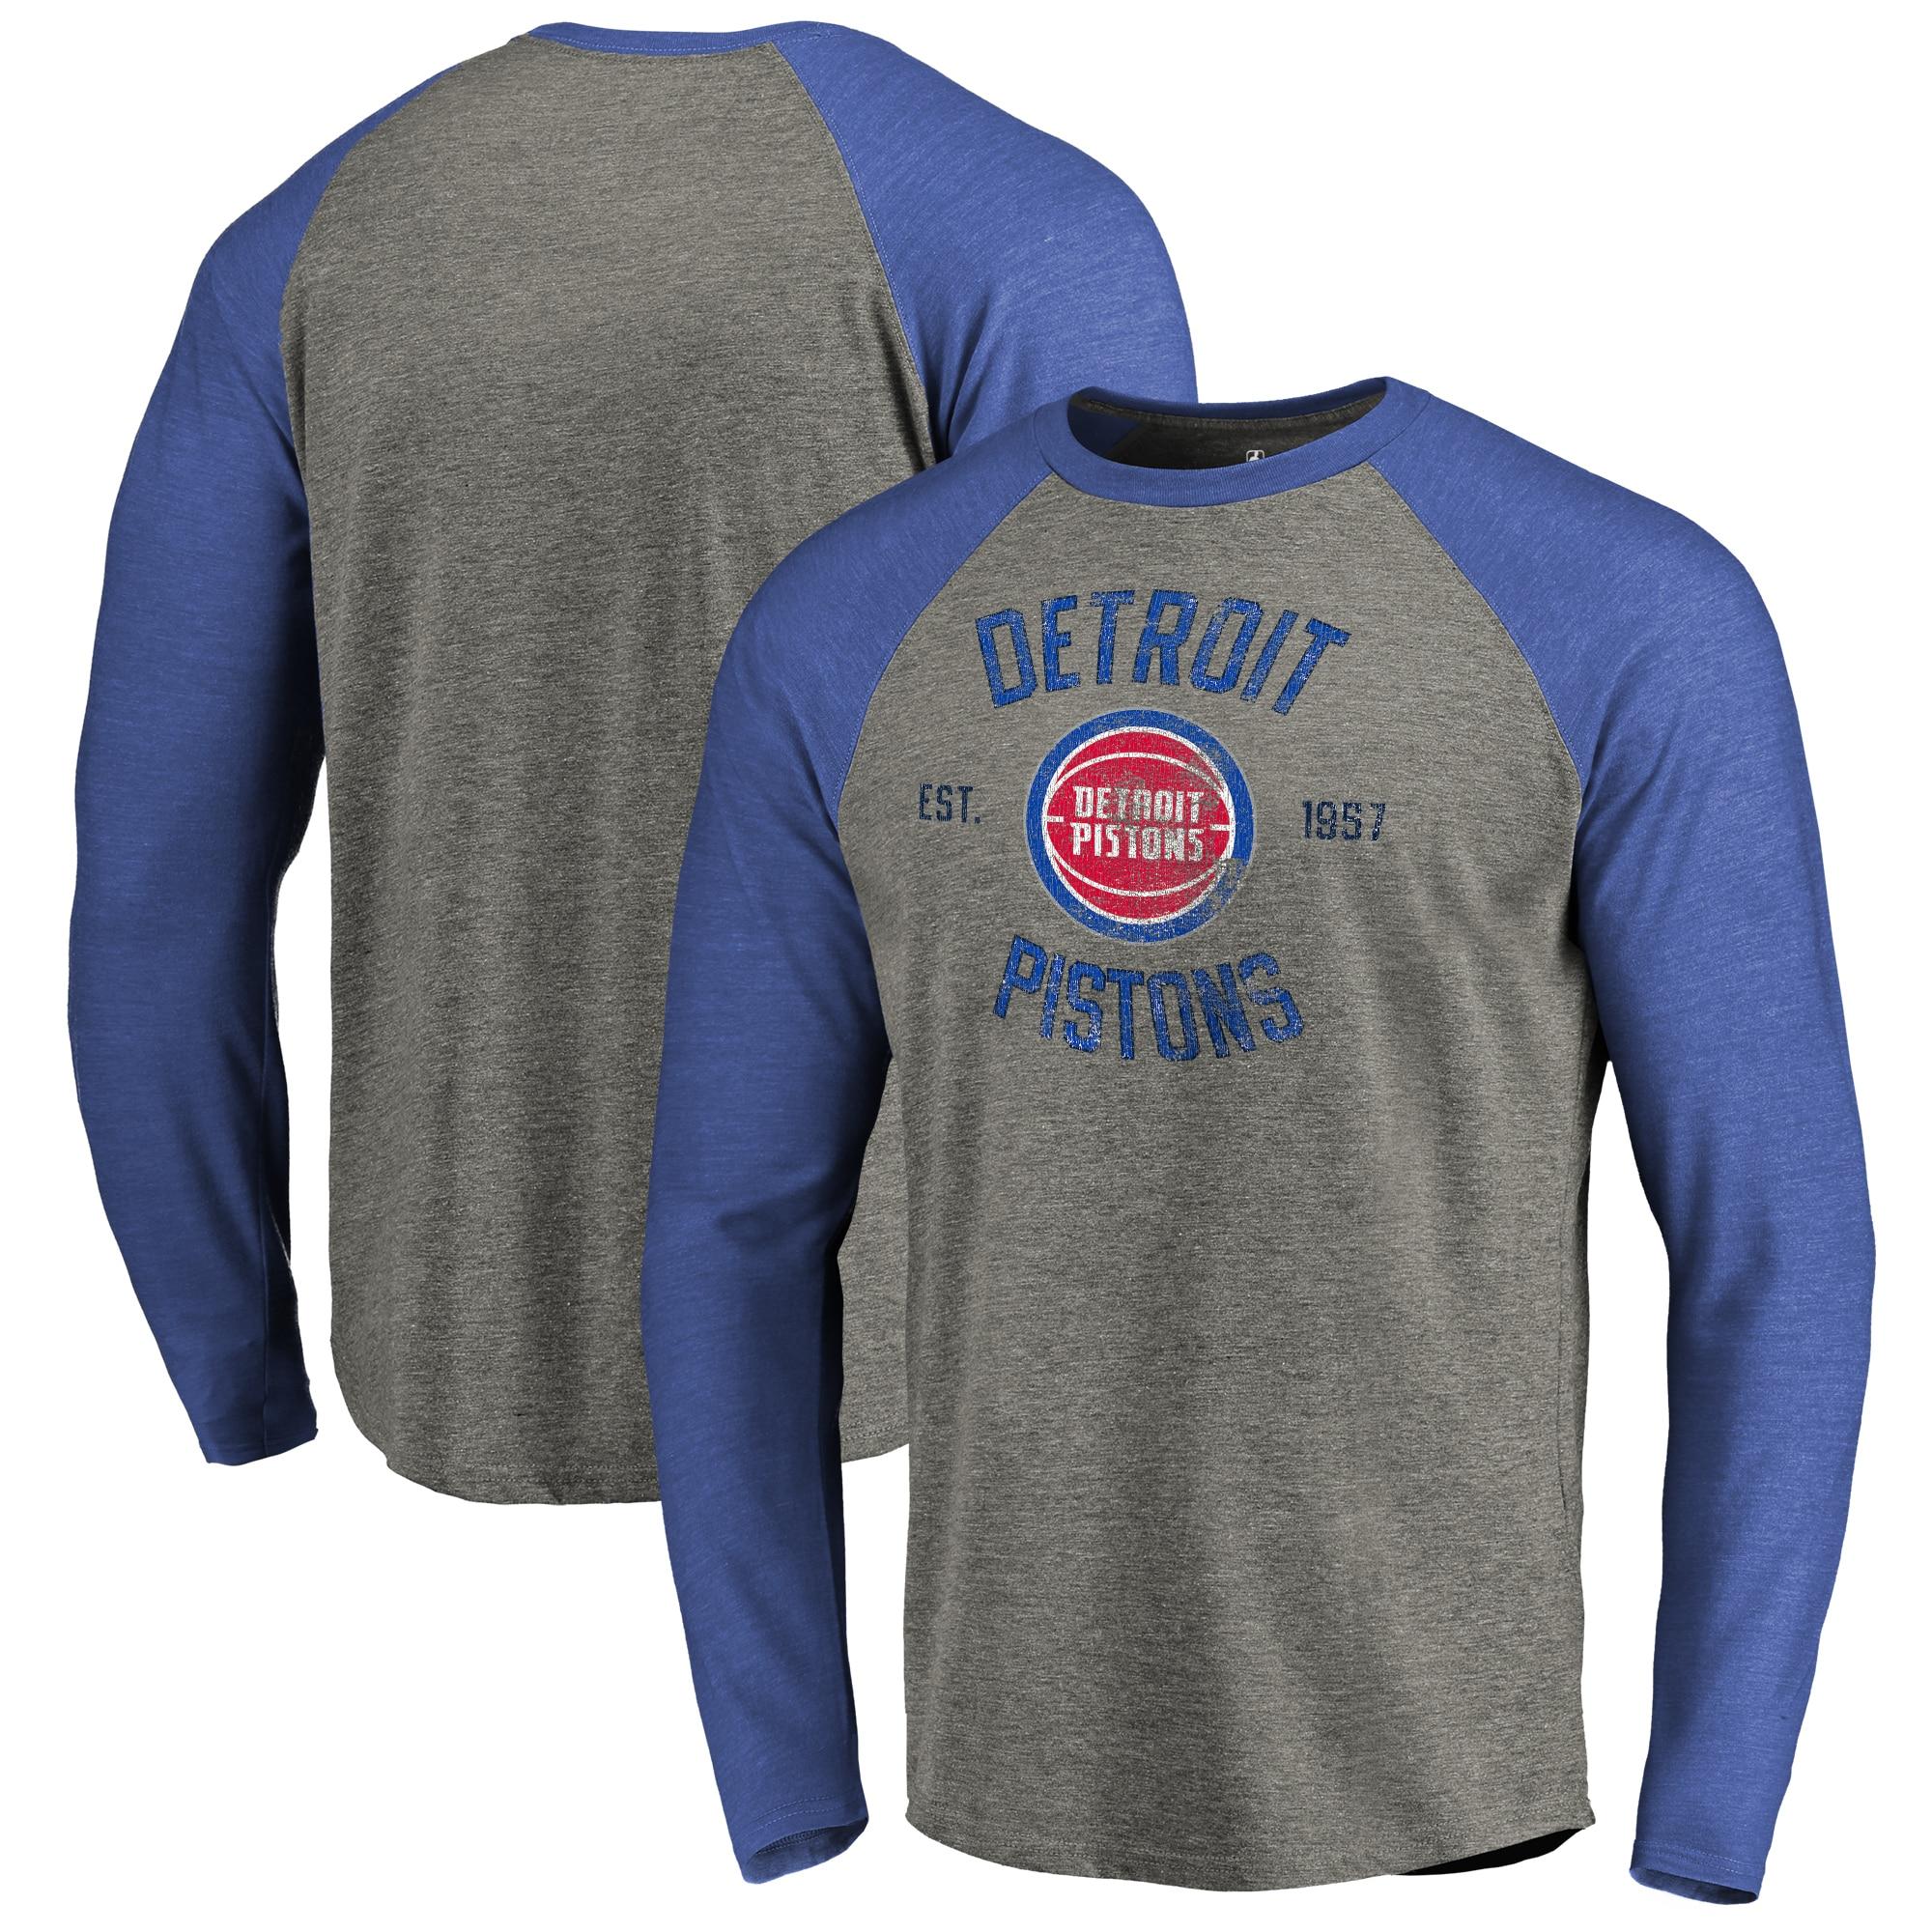 Detroit Pistons Fanatics Branded Heritage Big and Tall Long Sleeve Tri-Blend Raglan T-Shirt - Heathered Gray